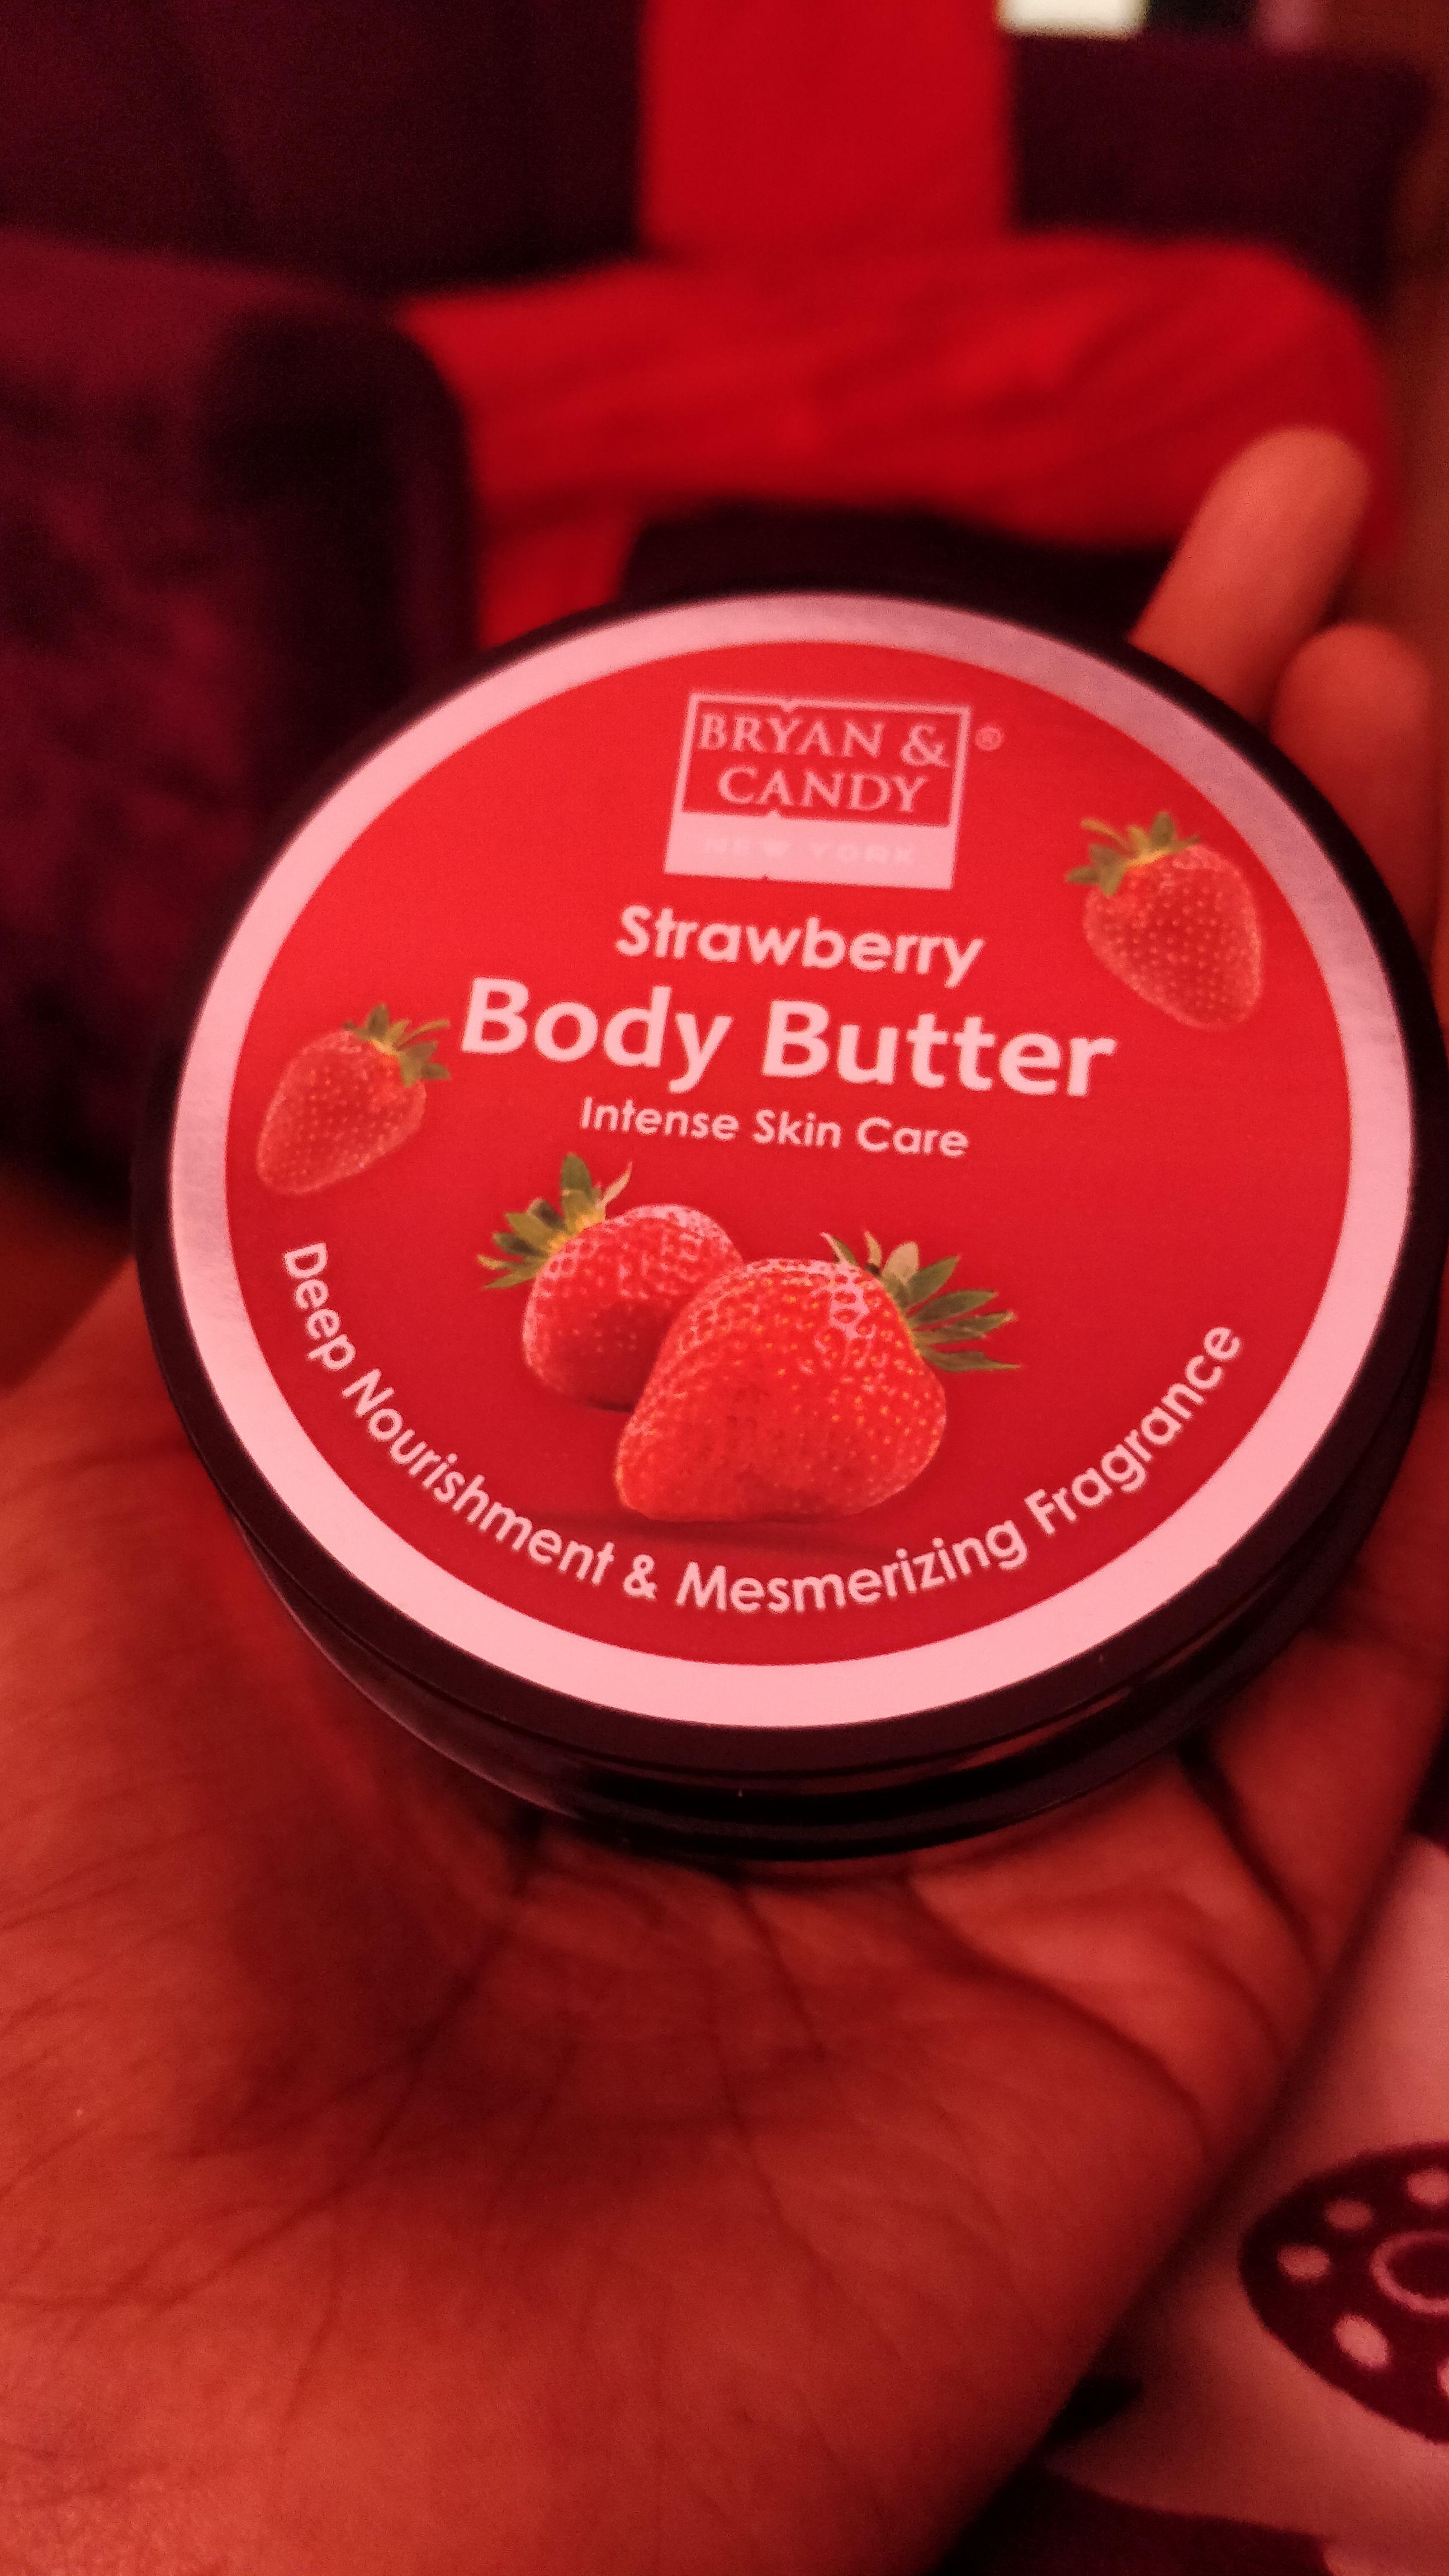 Bryan & Candy New York Strawberry Body Butter -Hydrating Body Butter-By christy_jose